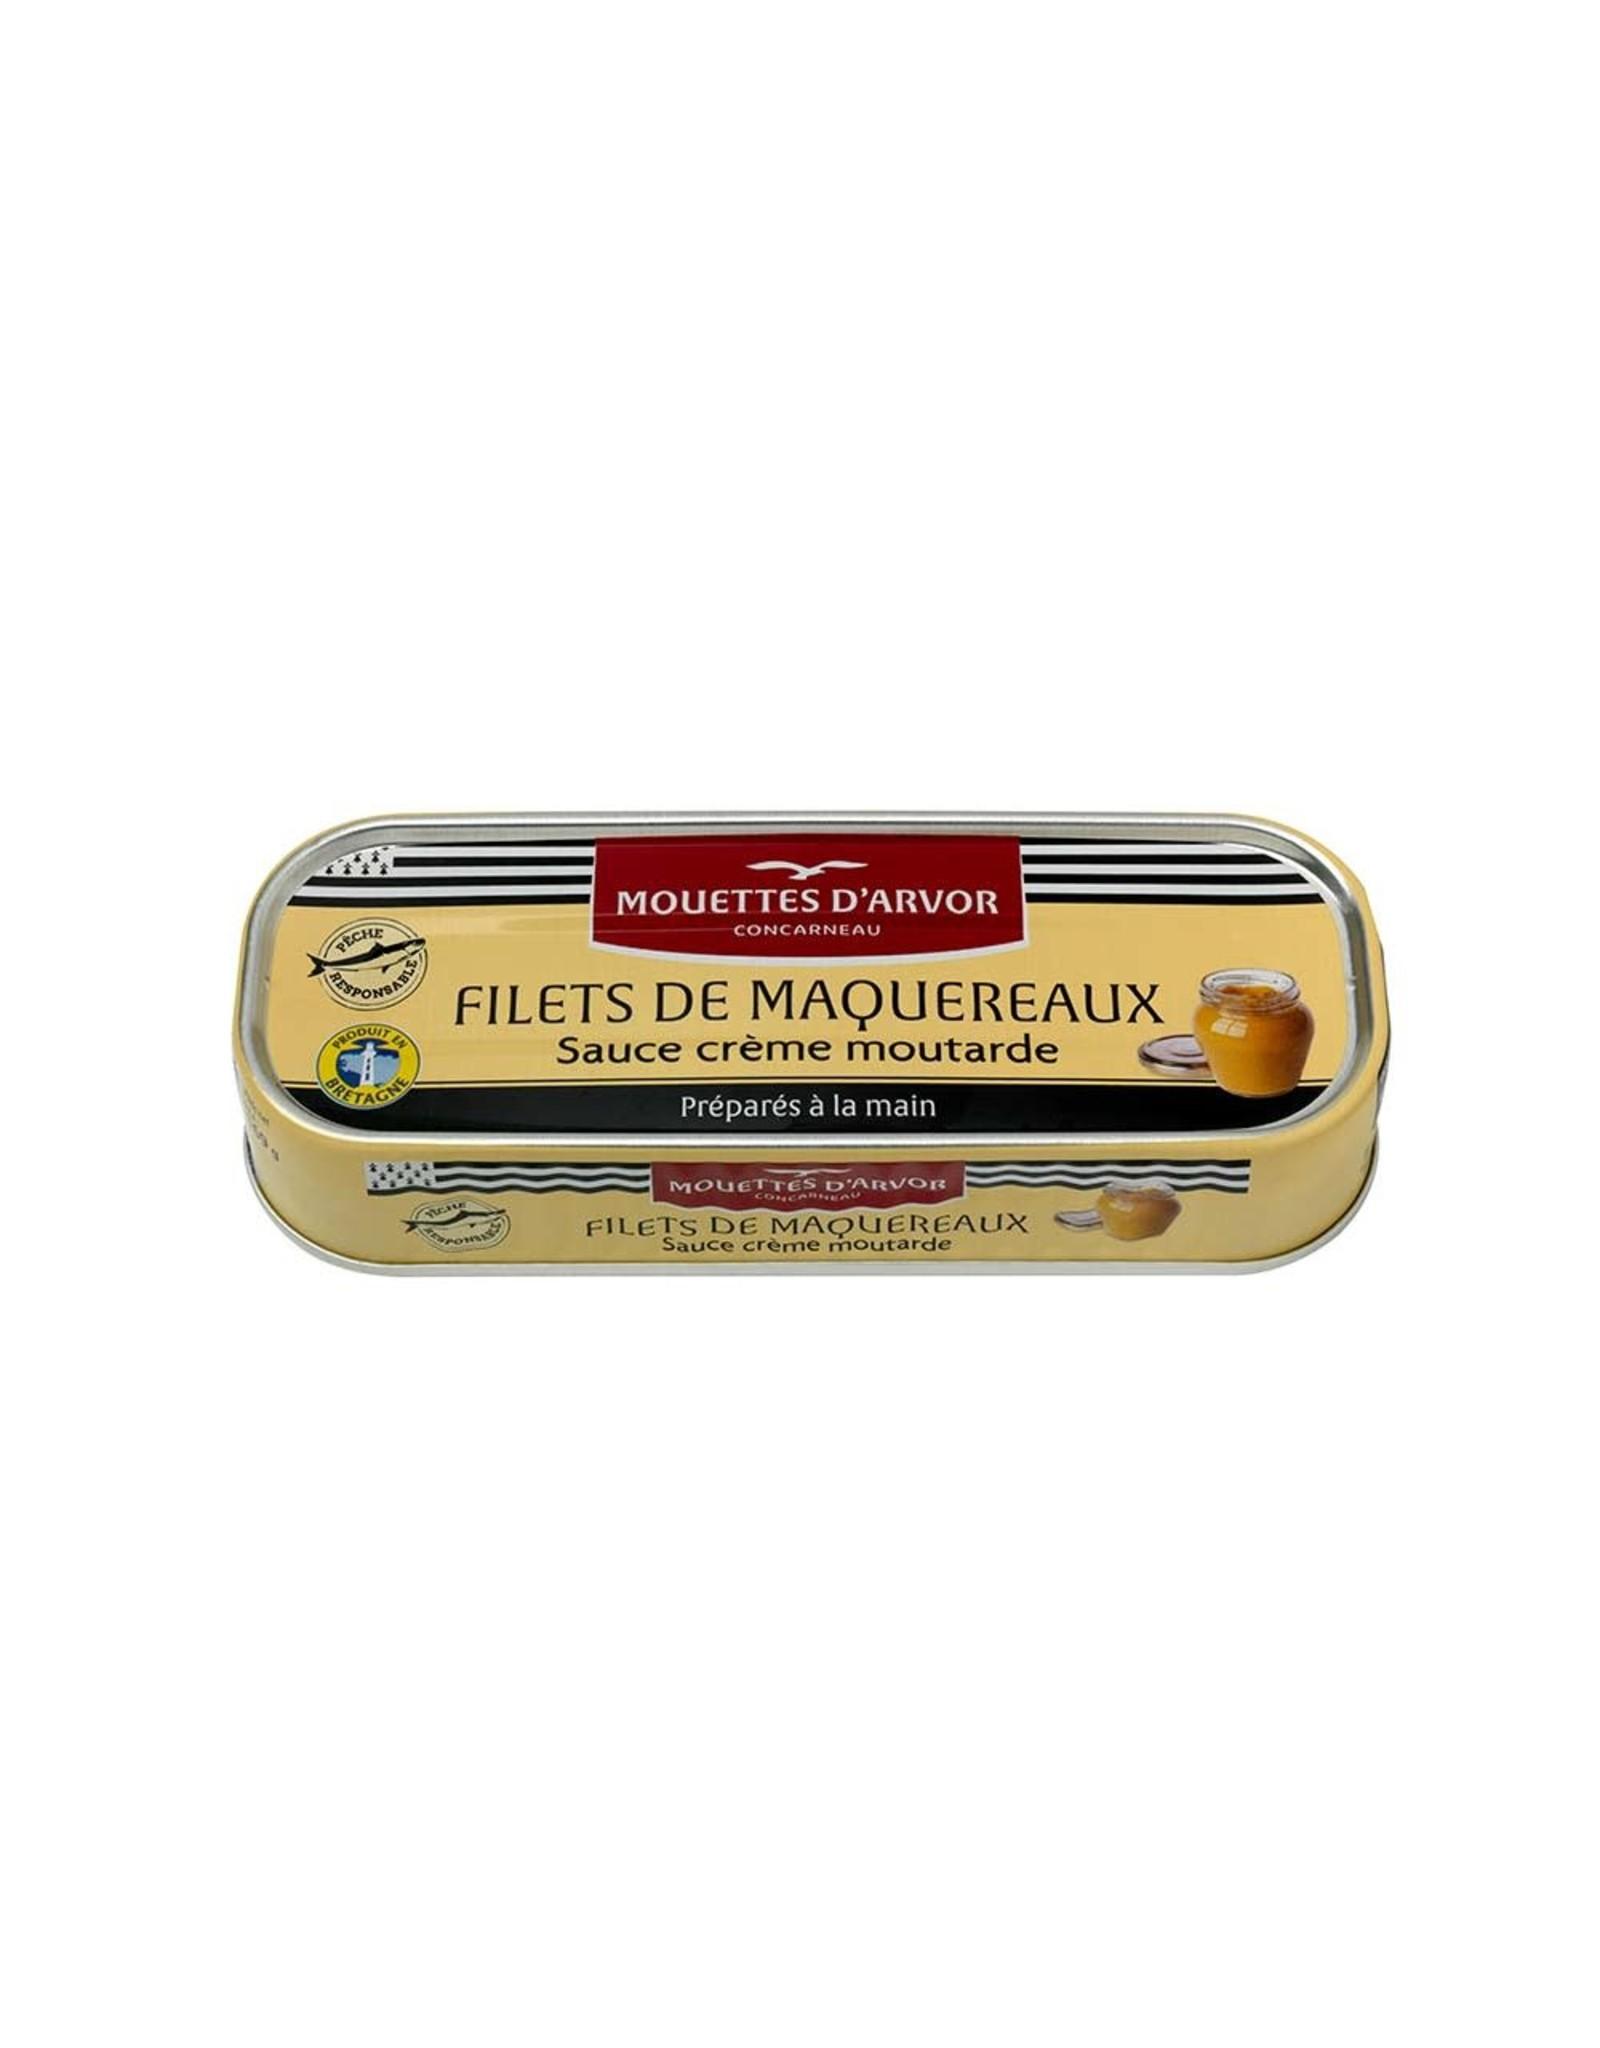 Mouettes d'arvor Mouettes d'arvor Mackerel Filets in Mustard & Creme Fraiche